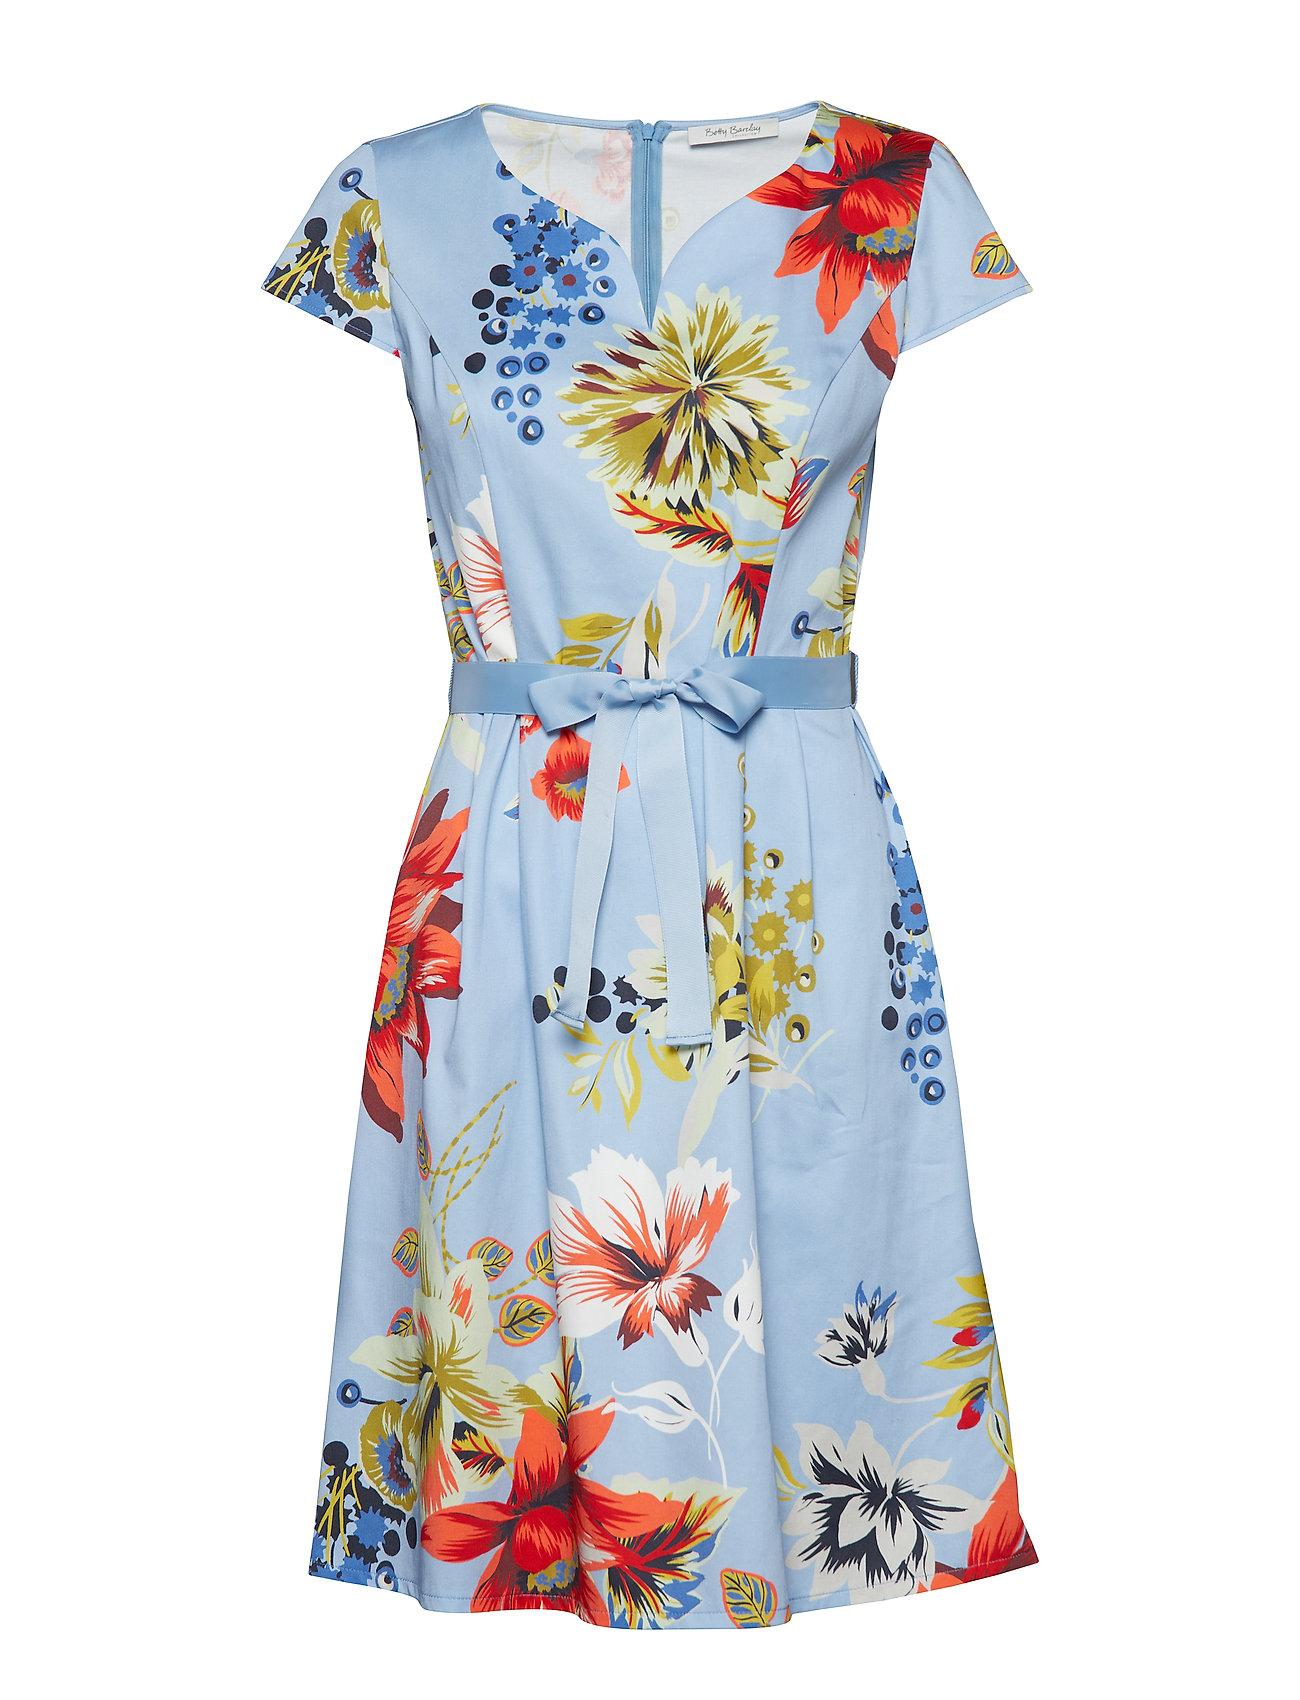 Short 2 1 Barclay Sleeveblue Dress redBetty sCxtQrhd